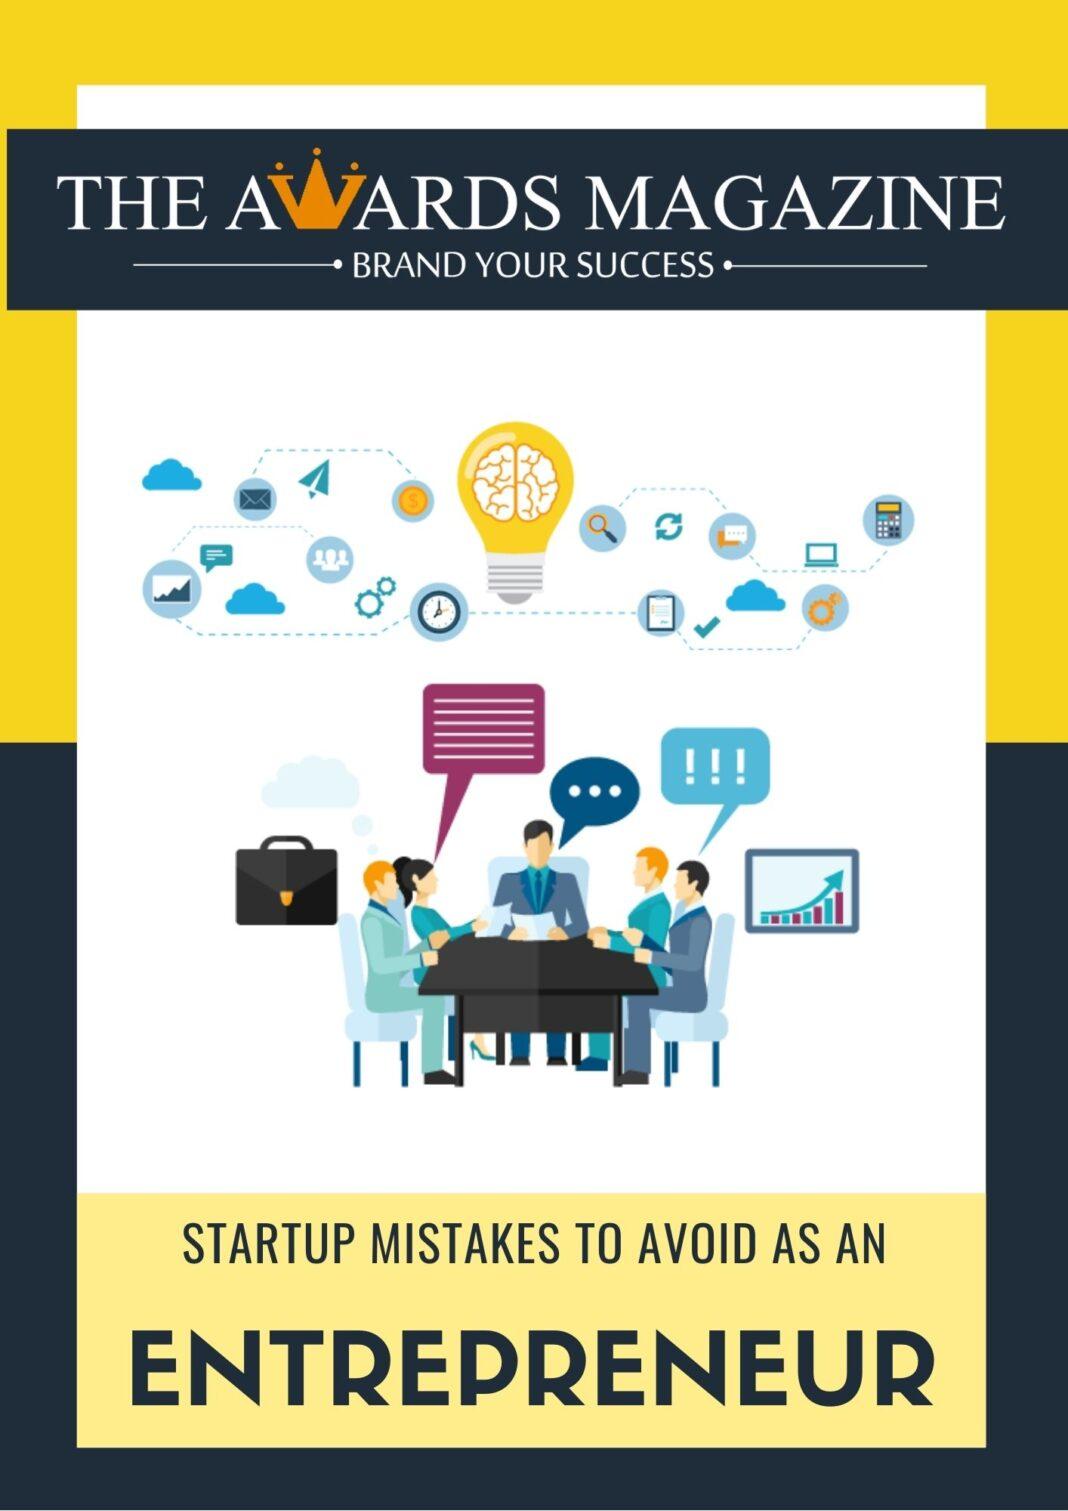 Top Startup Mistakes to Avoid as an Entrepreneur